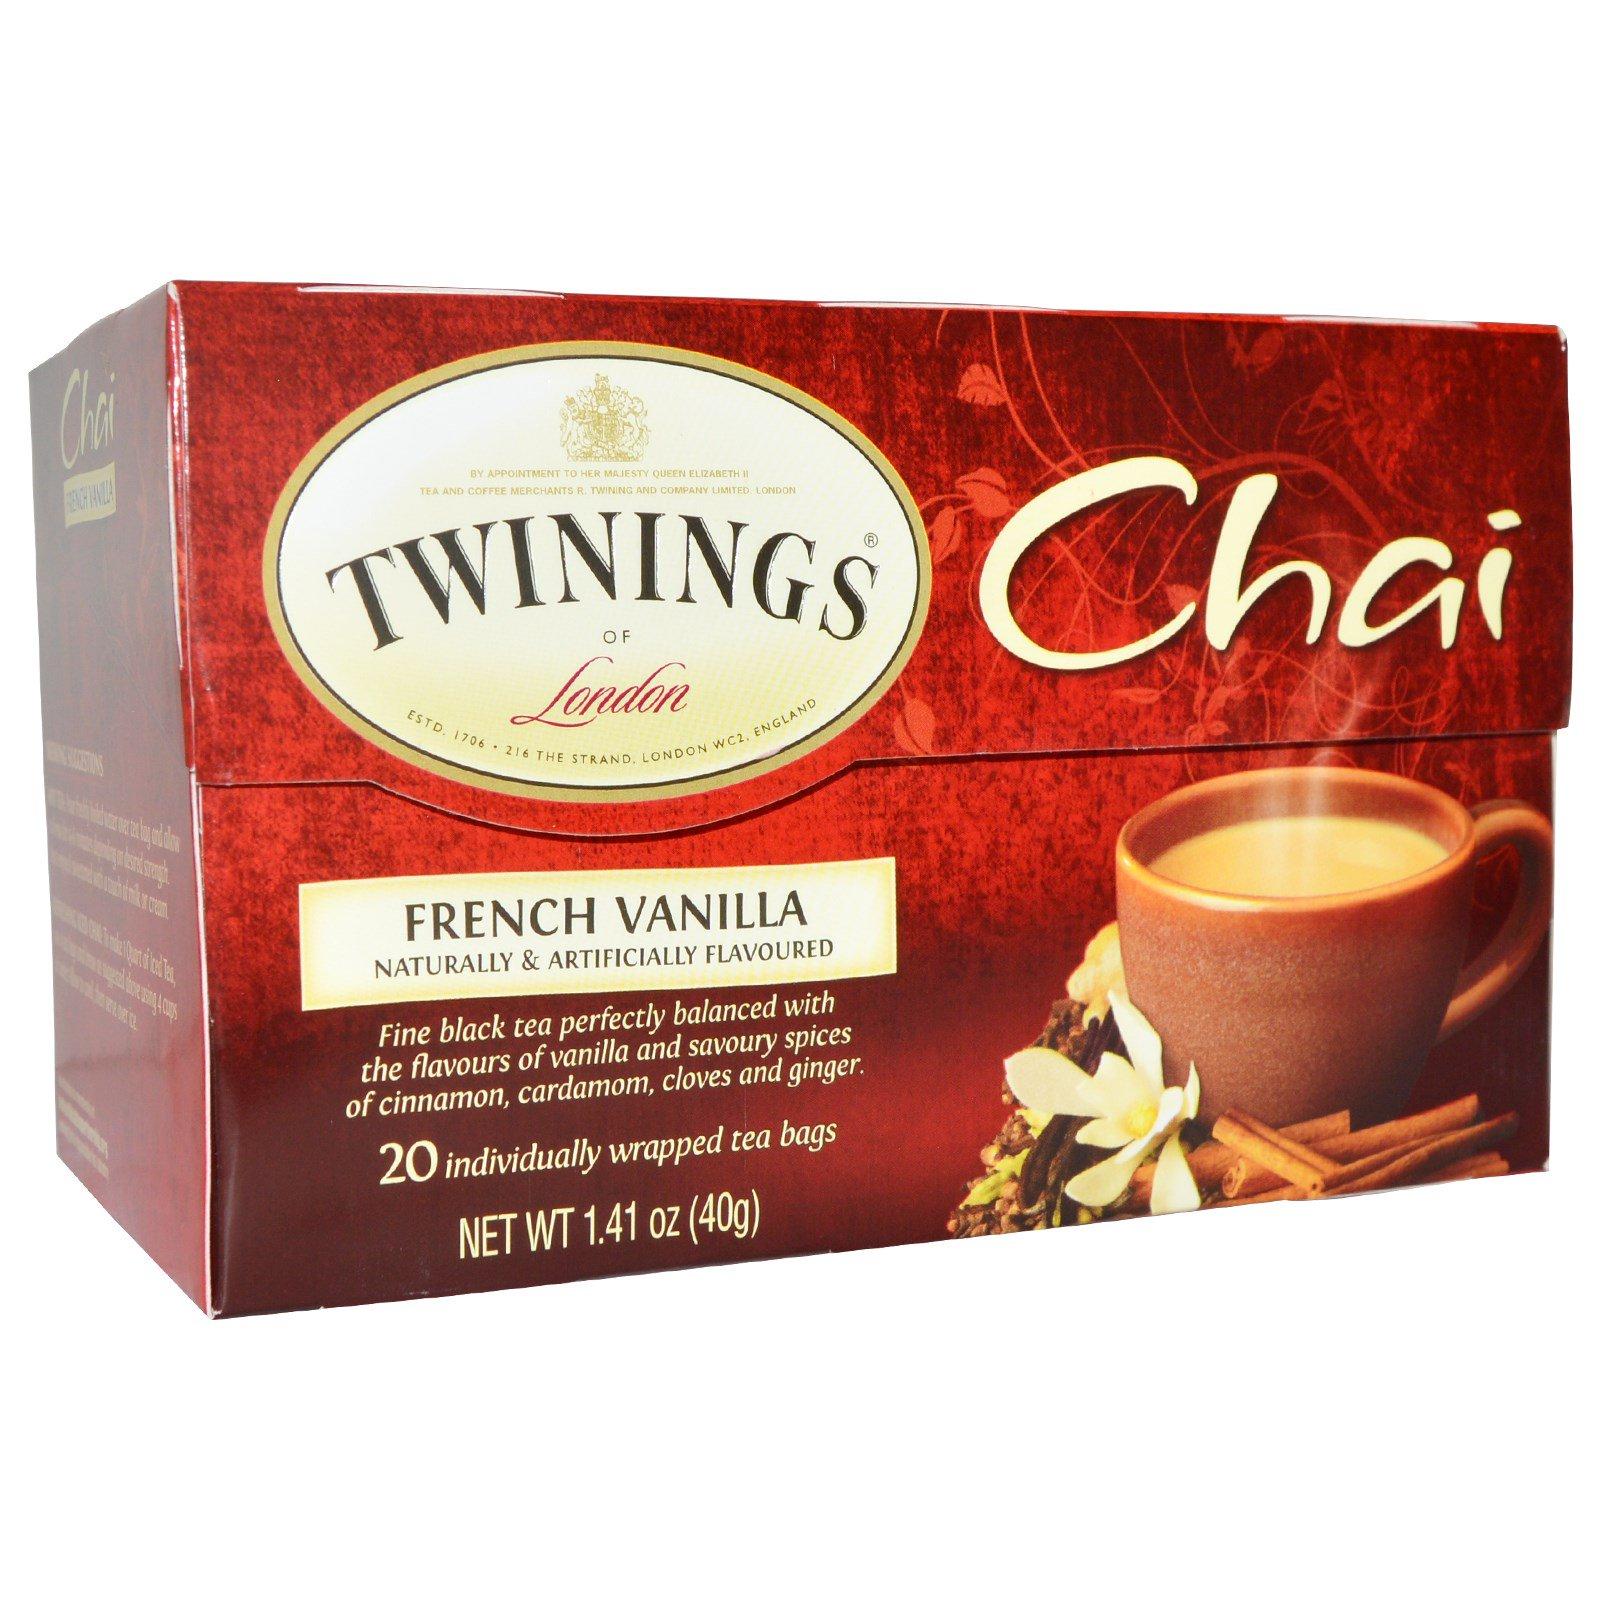 Twinings, Chai, French Vanilla, 20 Tea Bags, 1.41 oz (40 g)